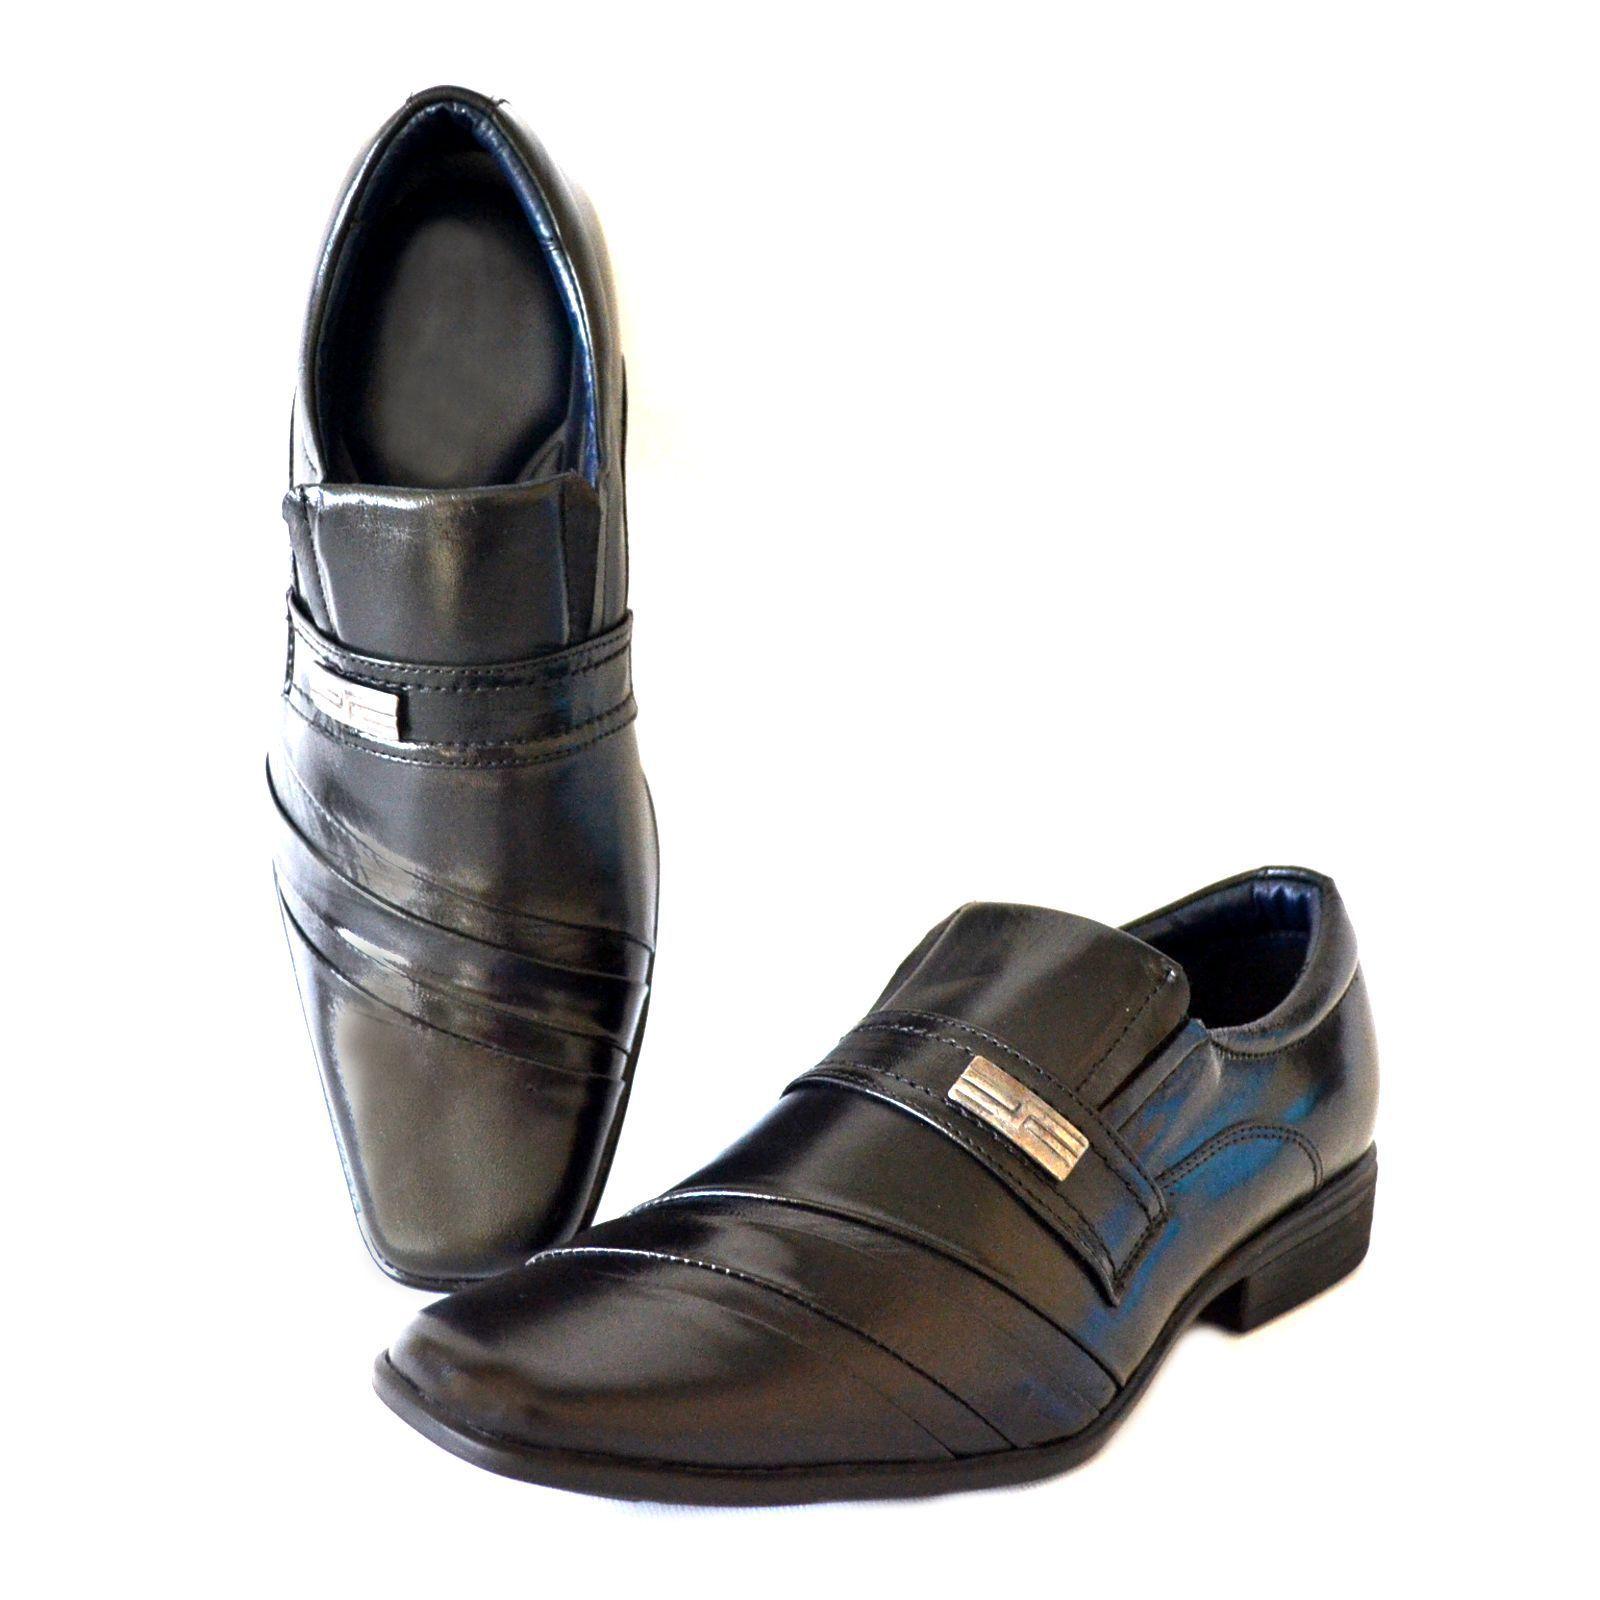 Sapato Prata Couro 1009478 Mestiço Preto